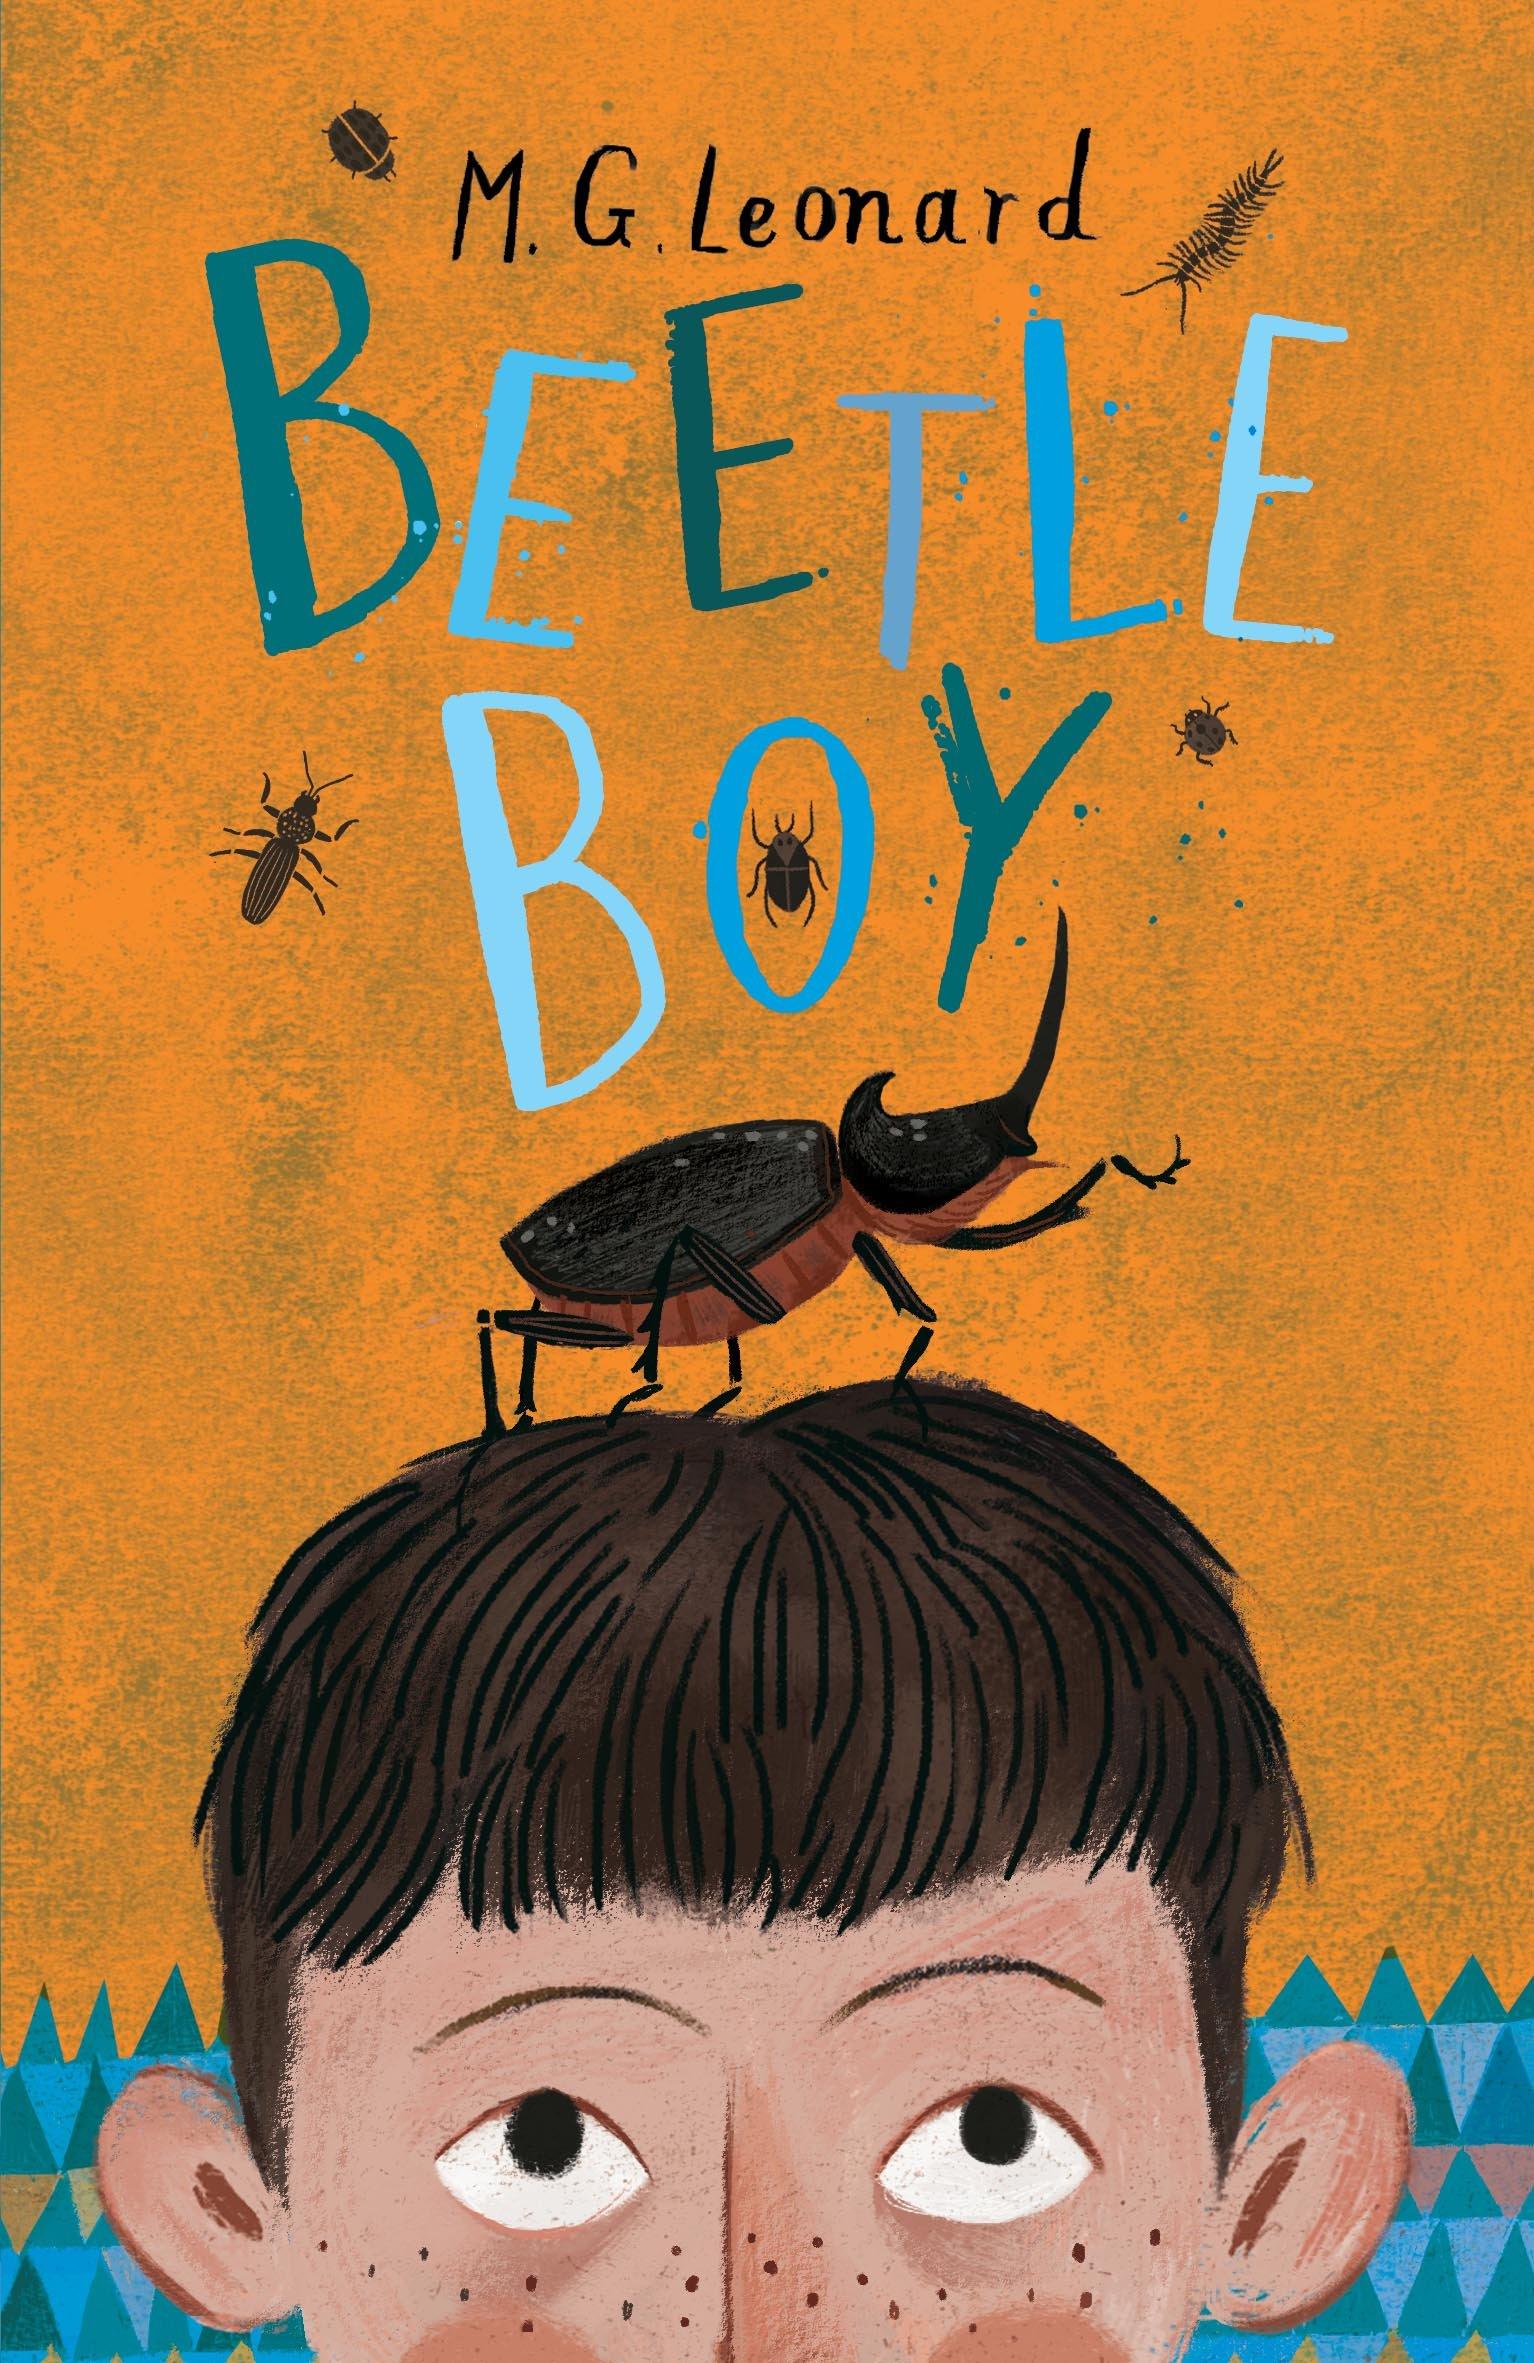 Beetle Boy Battle of the Beetles Book 1 : A Tom Fletcher Book Club ...